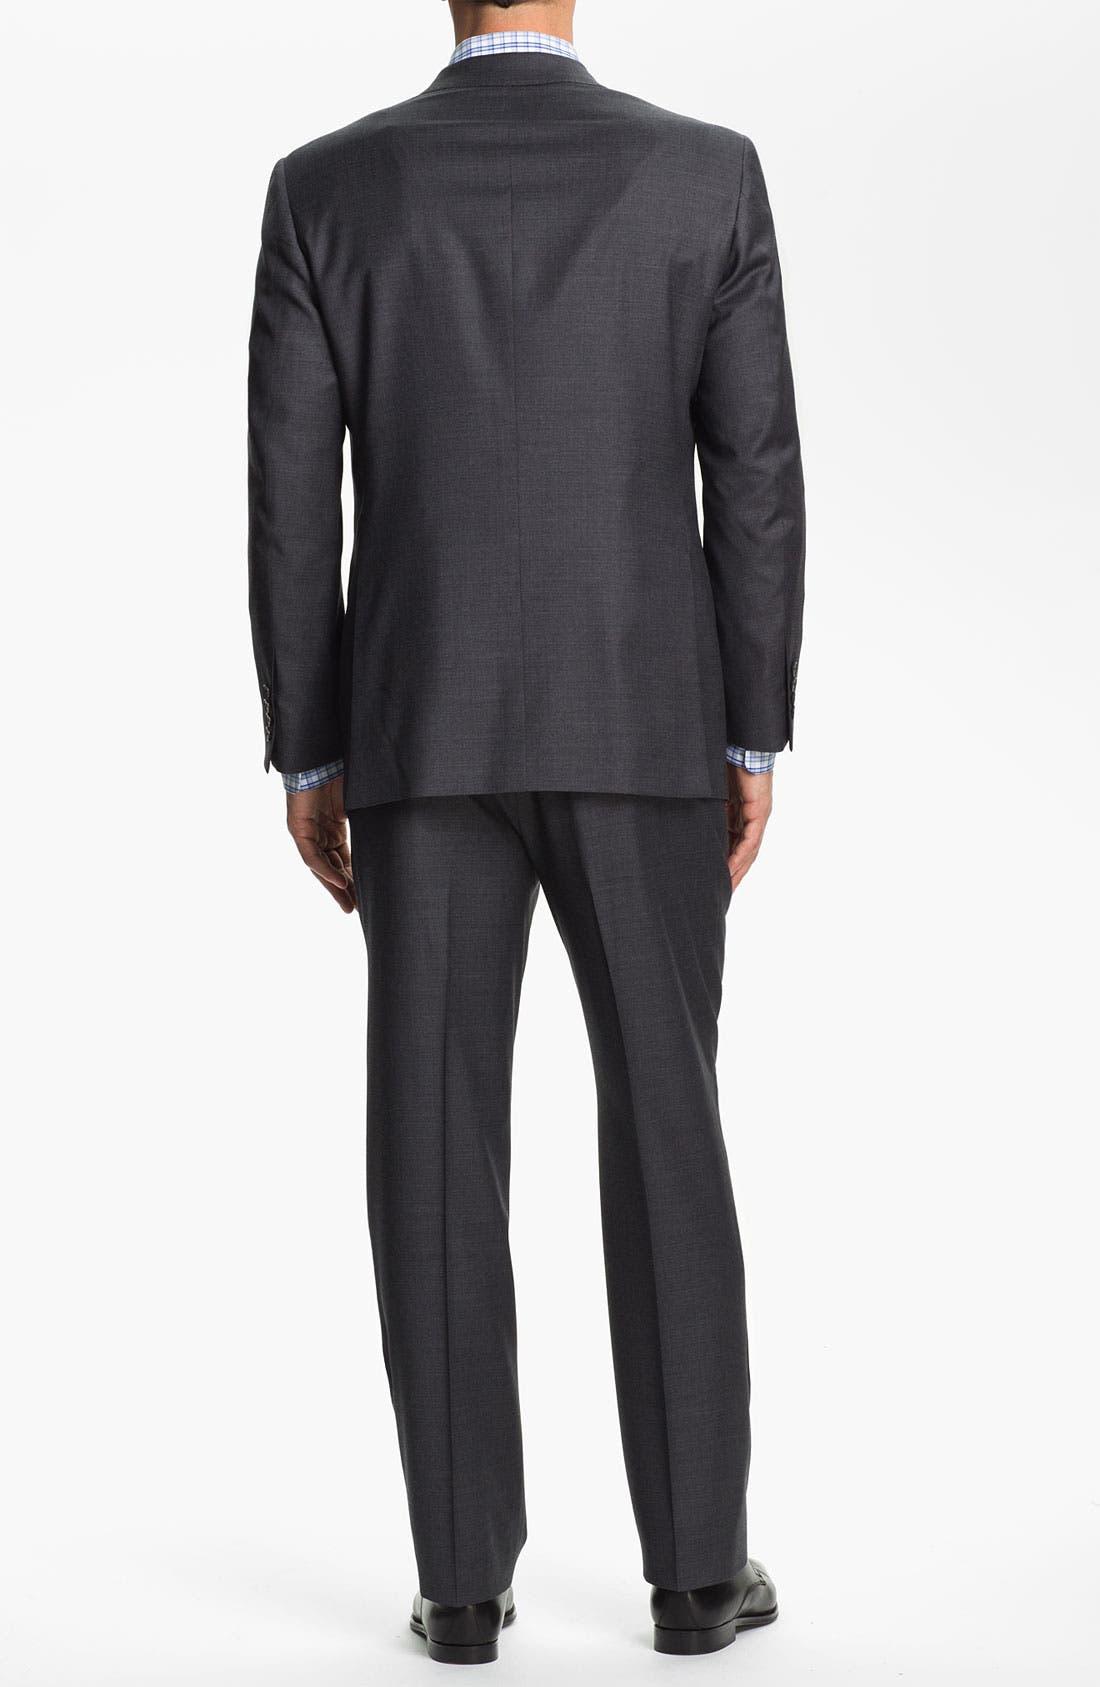 SAMUELSOHN,                             'Performance' Stretch Wool Suit,                             Alternate thumbnail 5, color,                             020